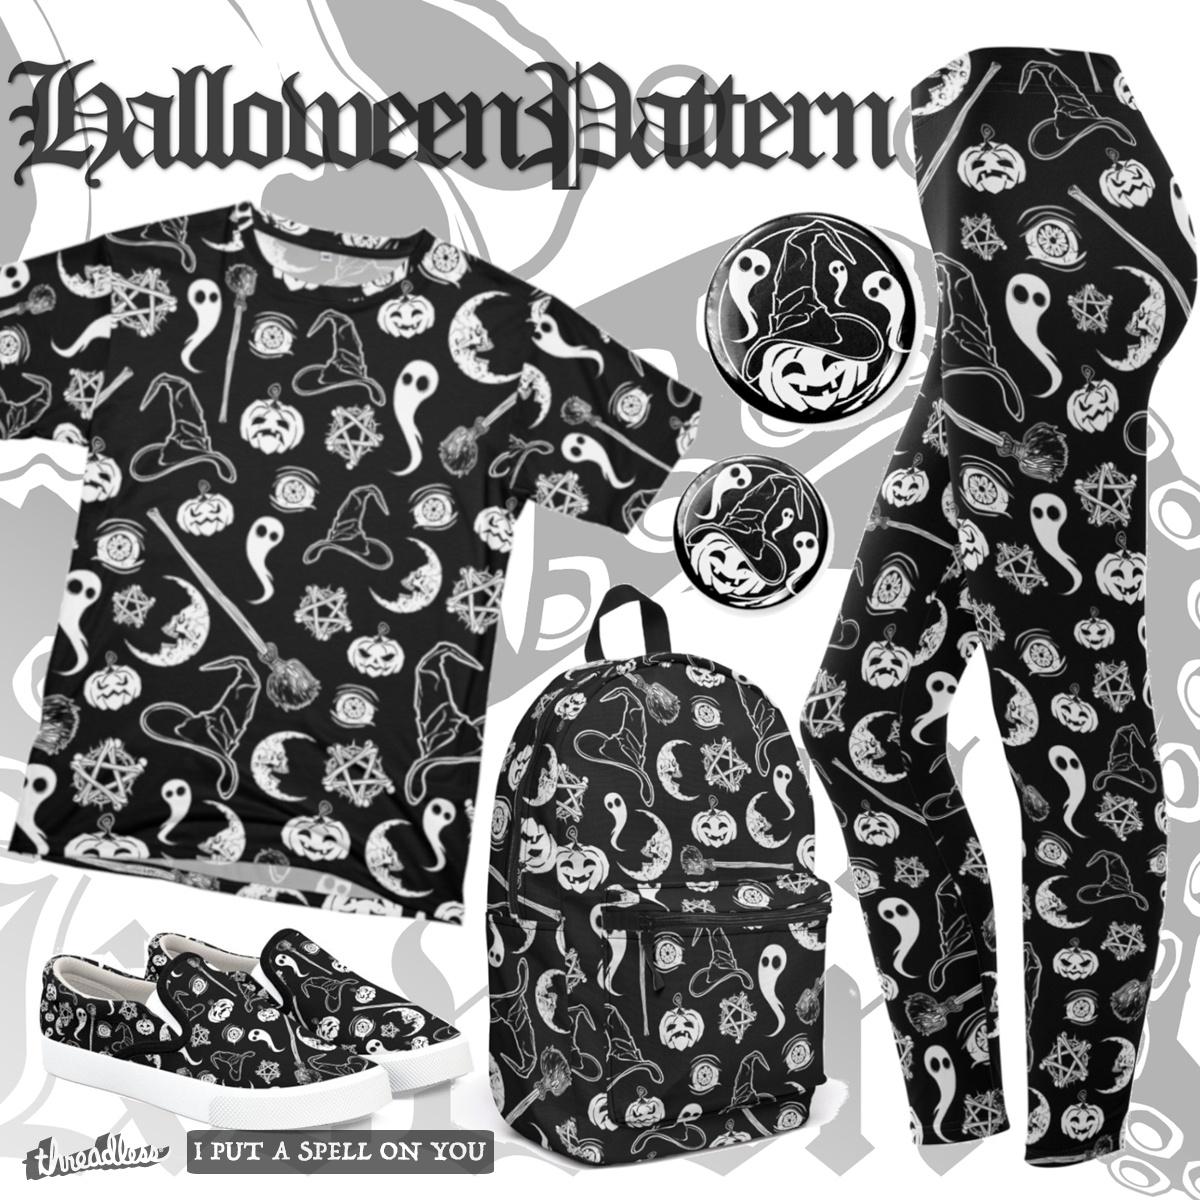 The Halloween Pattern by vonKowen on Threadless